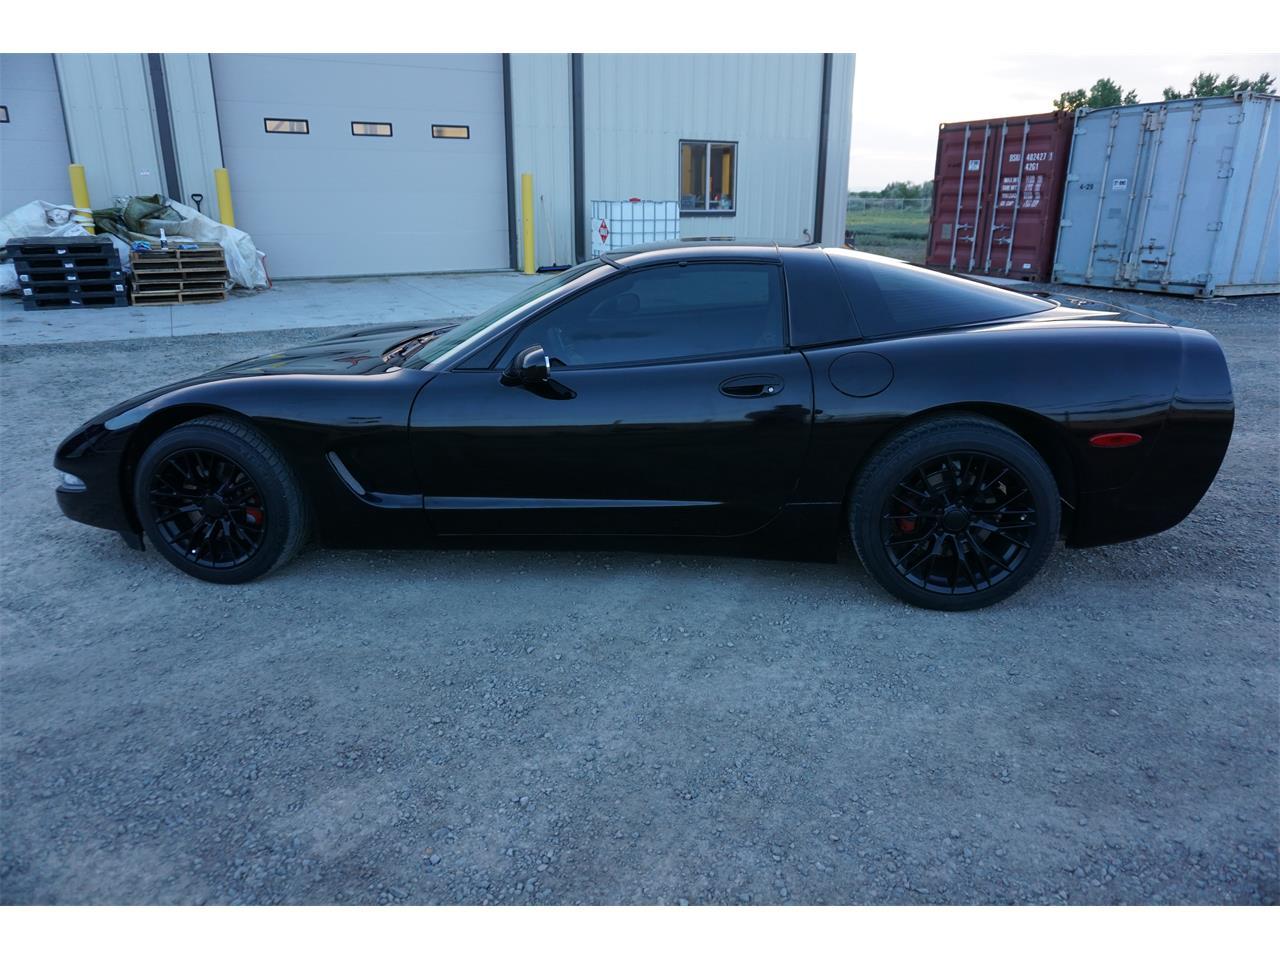 Large Picture of '02 Corvette located in Grand Junction Colorado - $15,000.00 - Q8JM